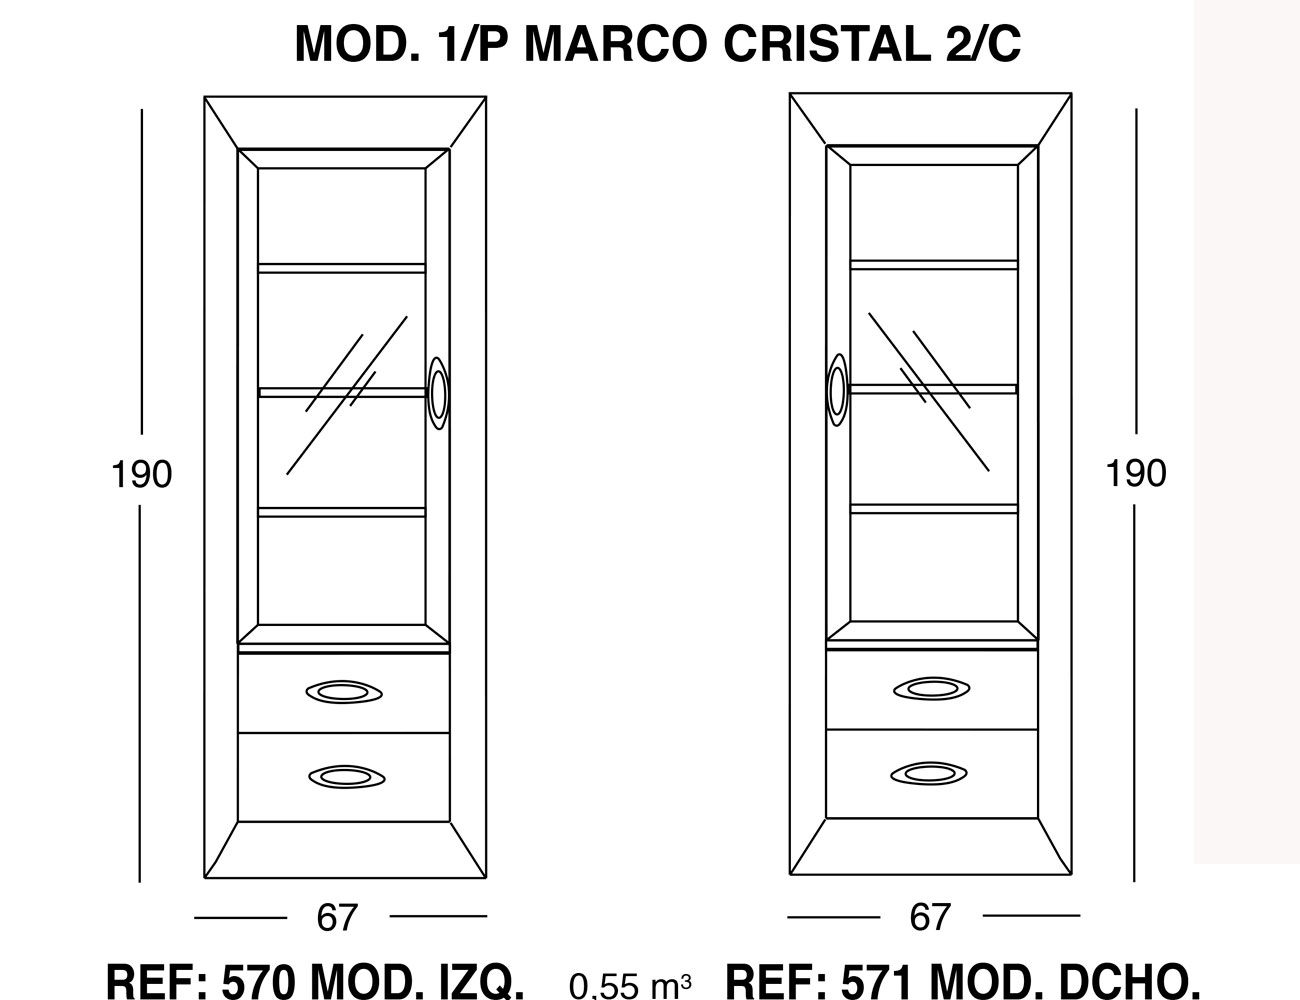 Modulo 1 puerta marco cristal 2 cajones